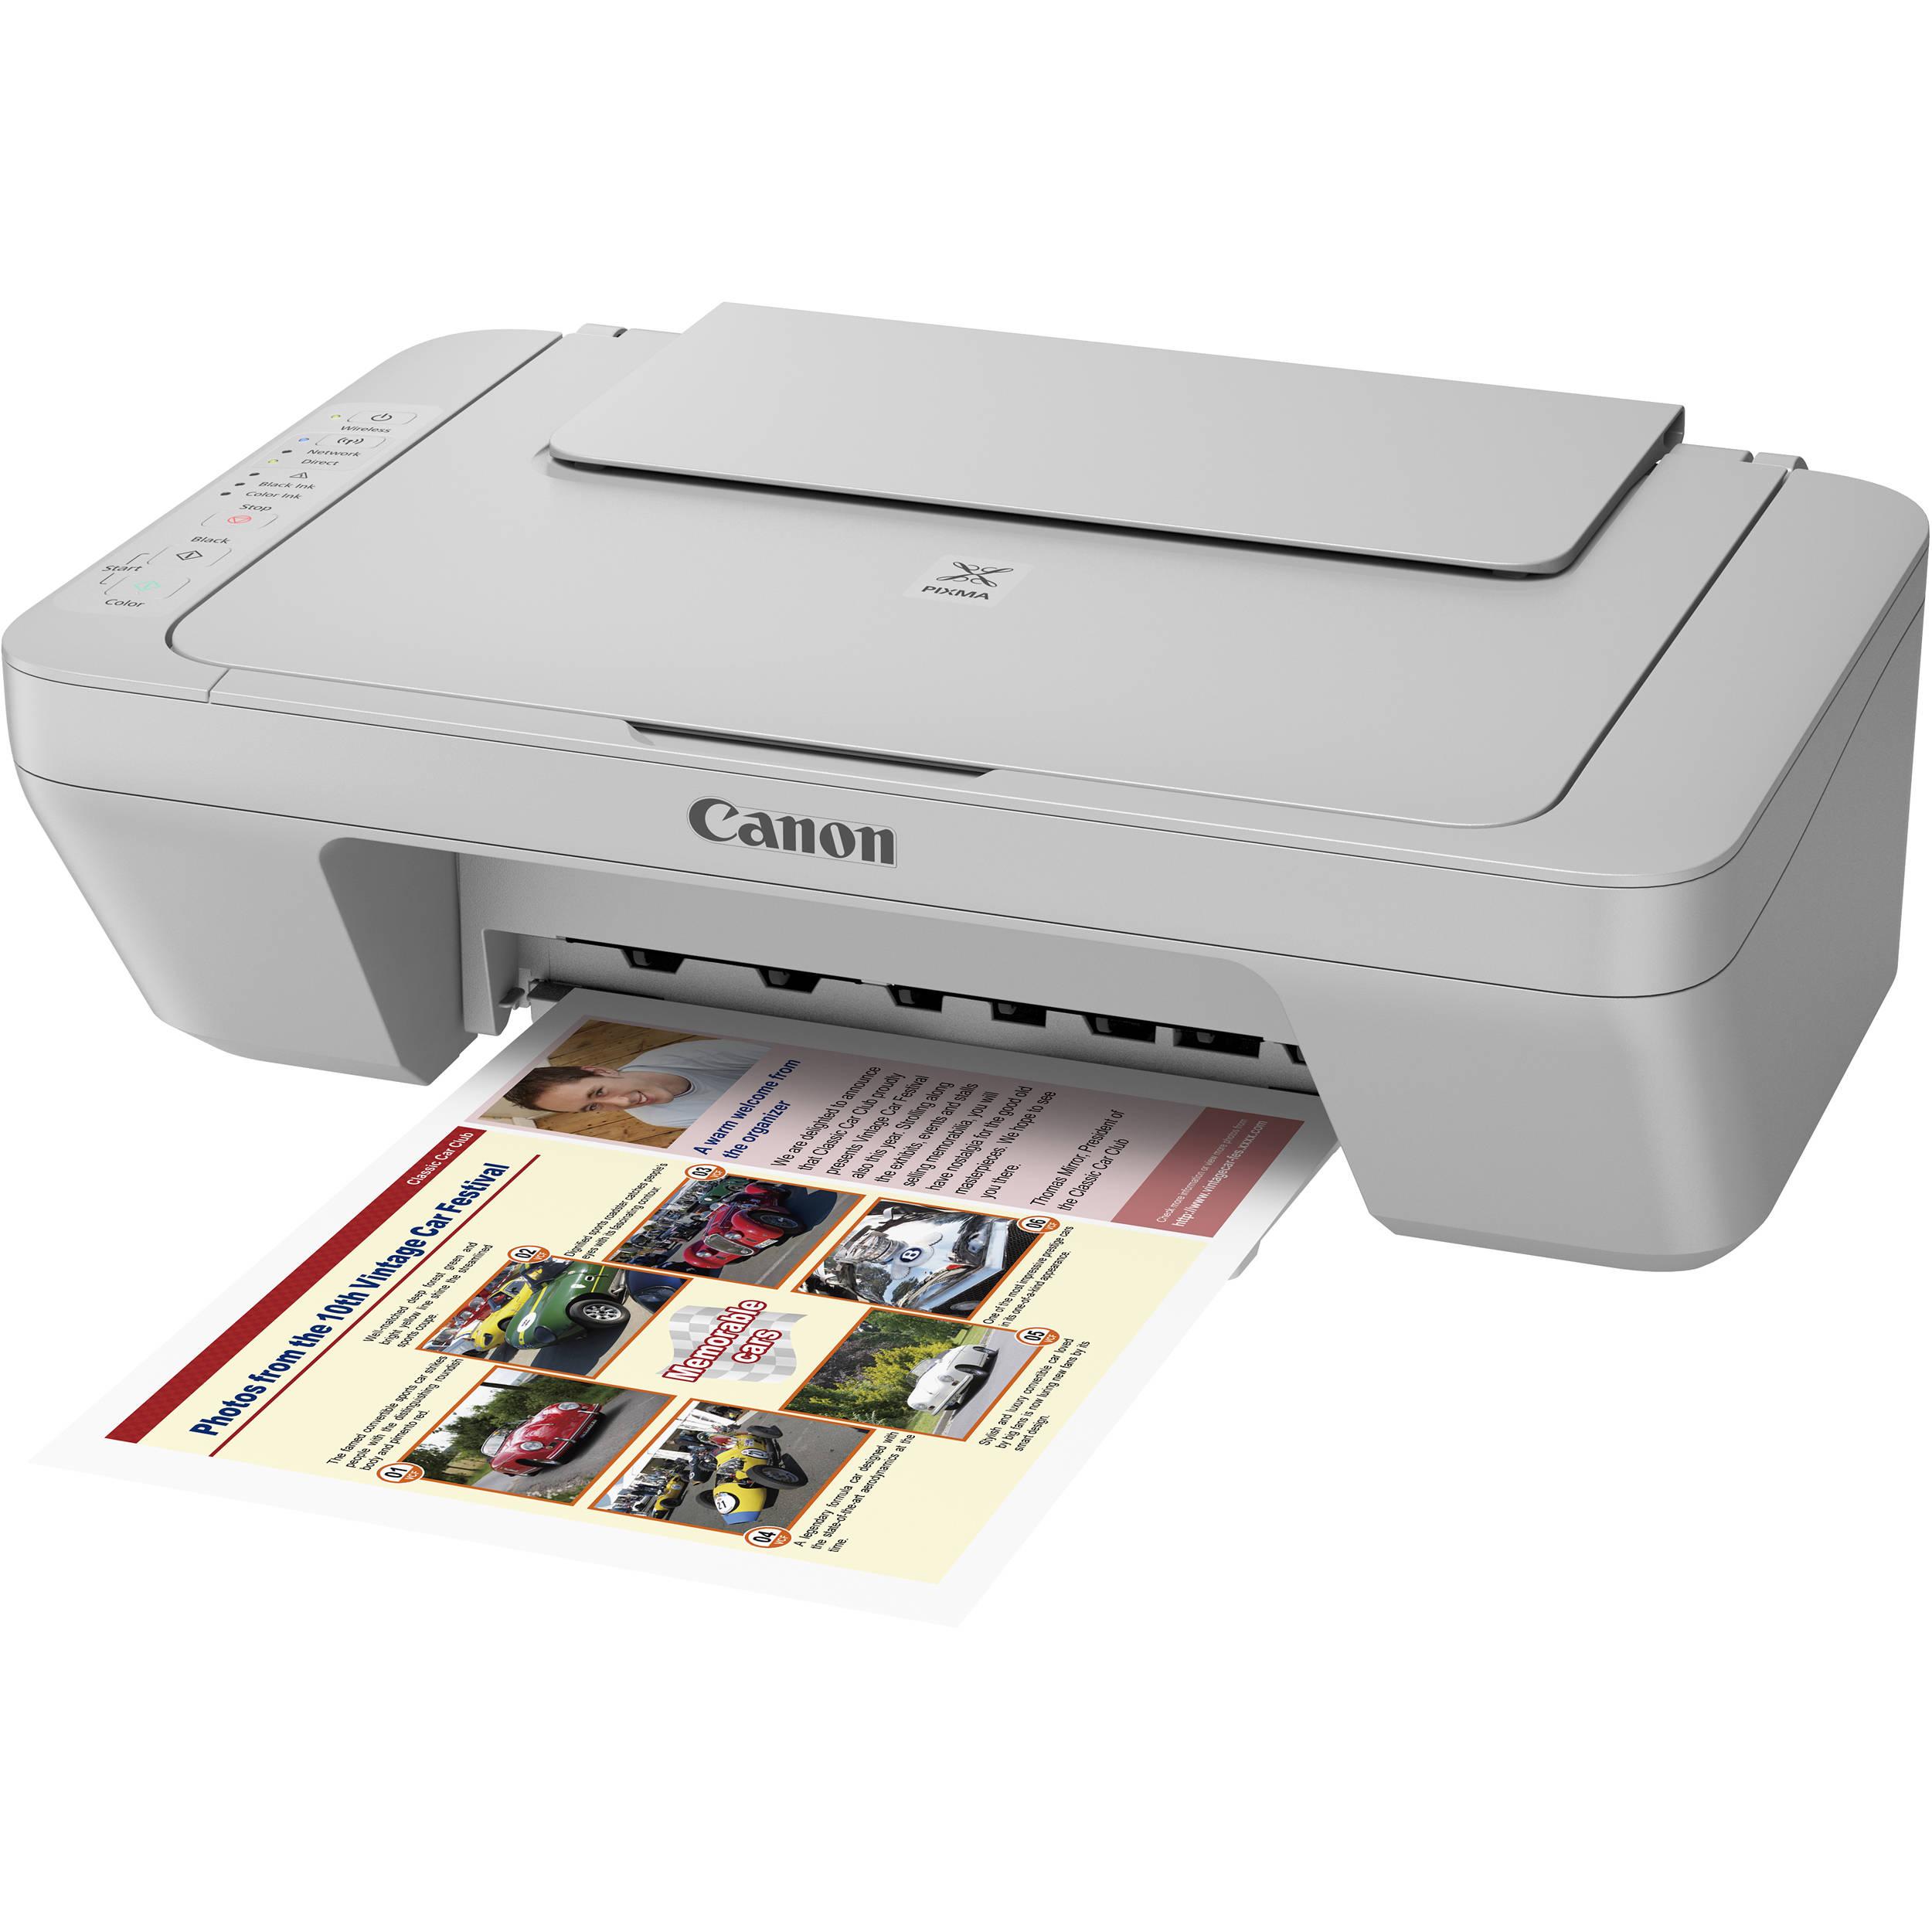 Canon PIXMA MG3020 Wireless All In One Inkjet Printer Gray